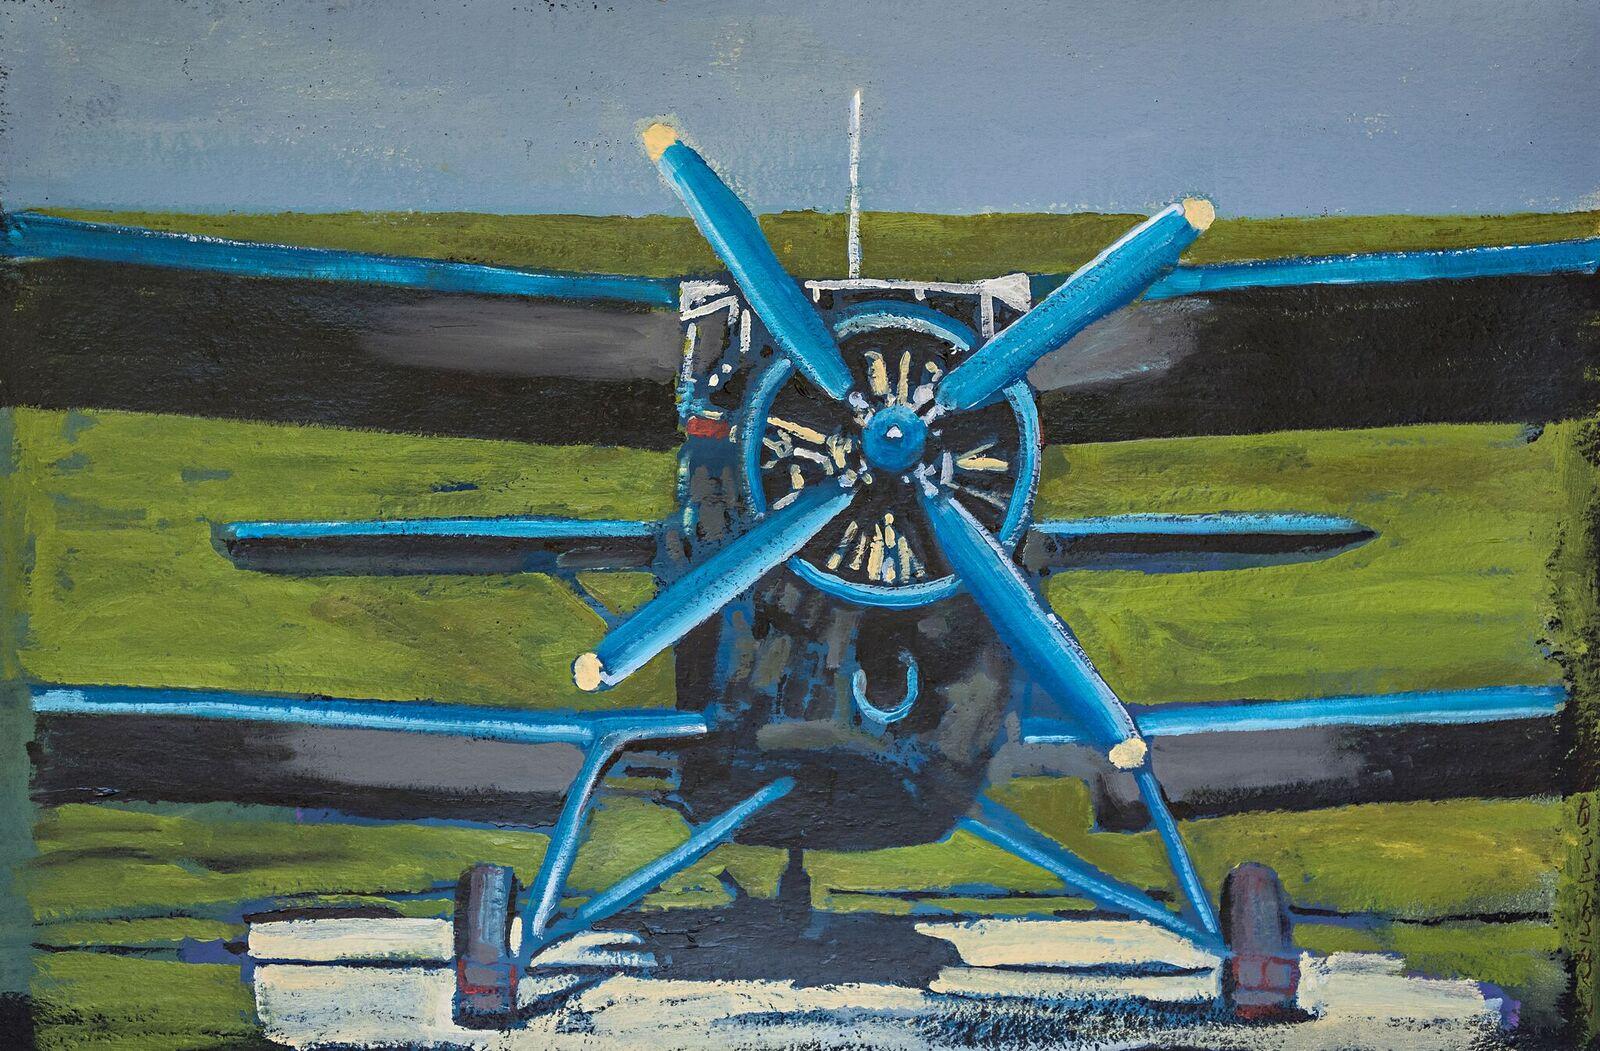 The Bluebird 36x52